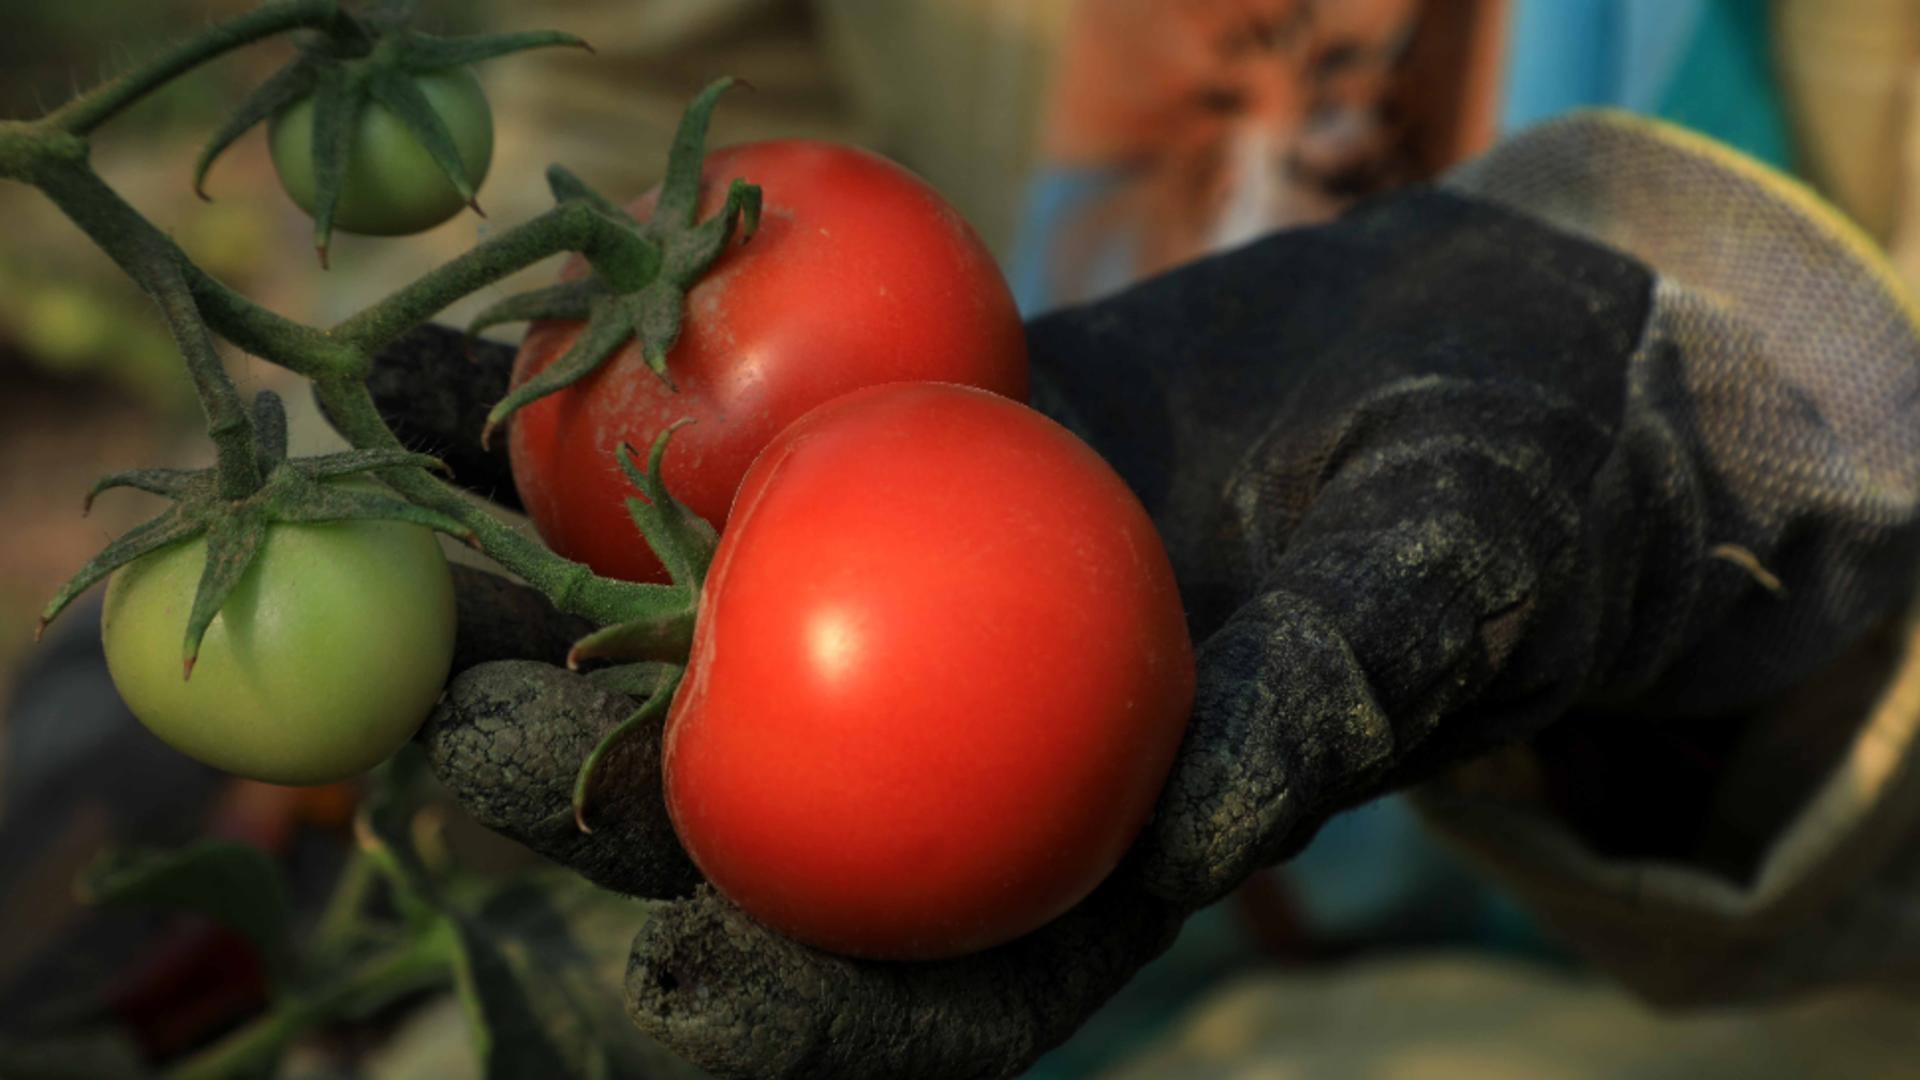 Cum alegi cele mai proaspete roșii? / Foto: Profi Media